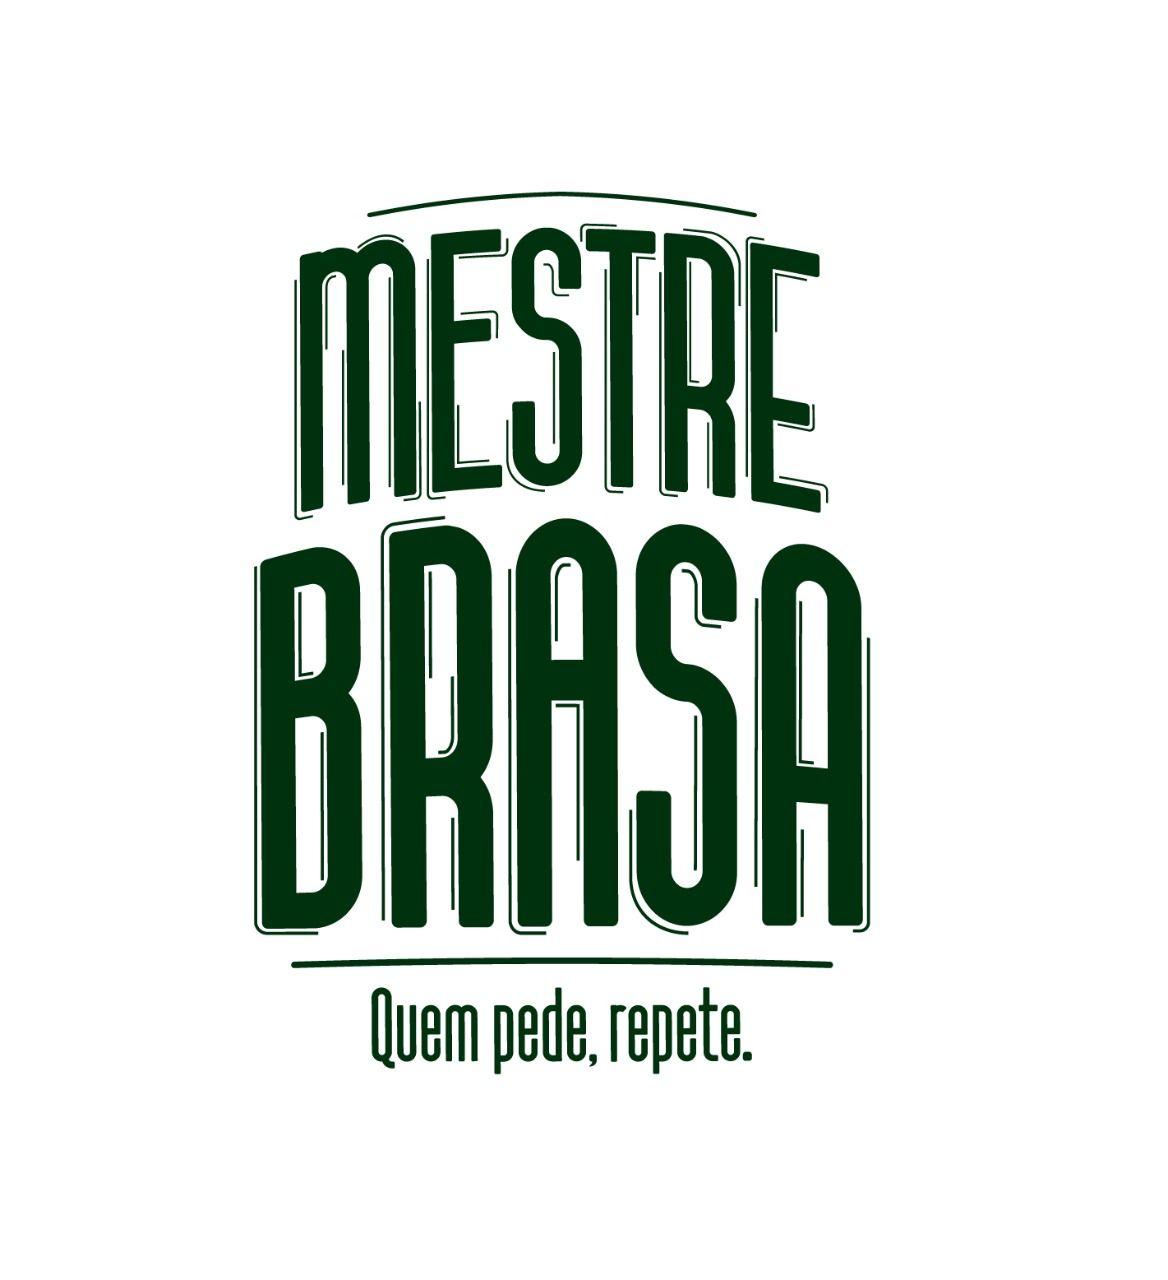 Mestre Brasa